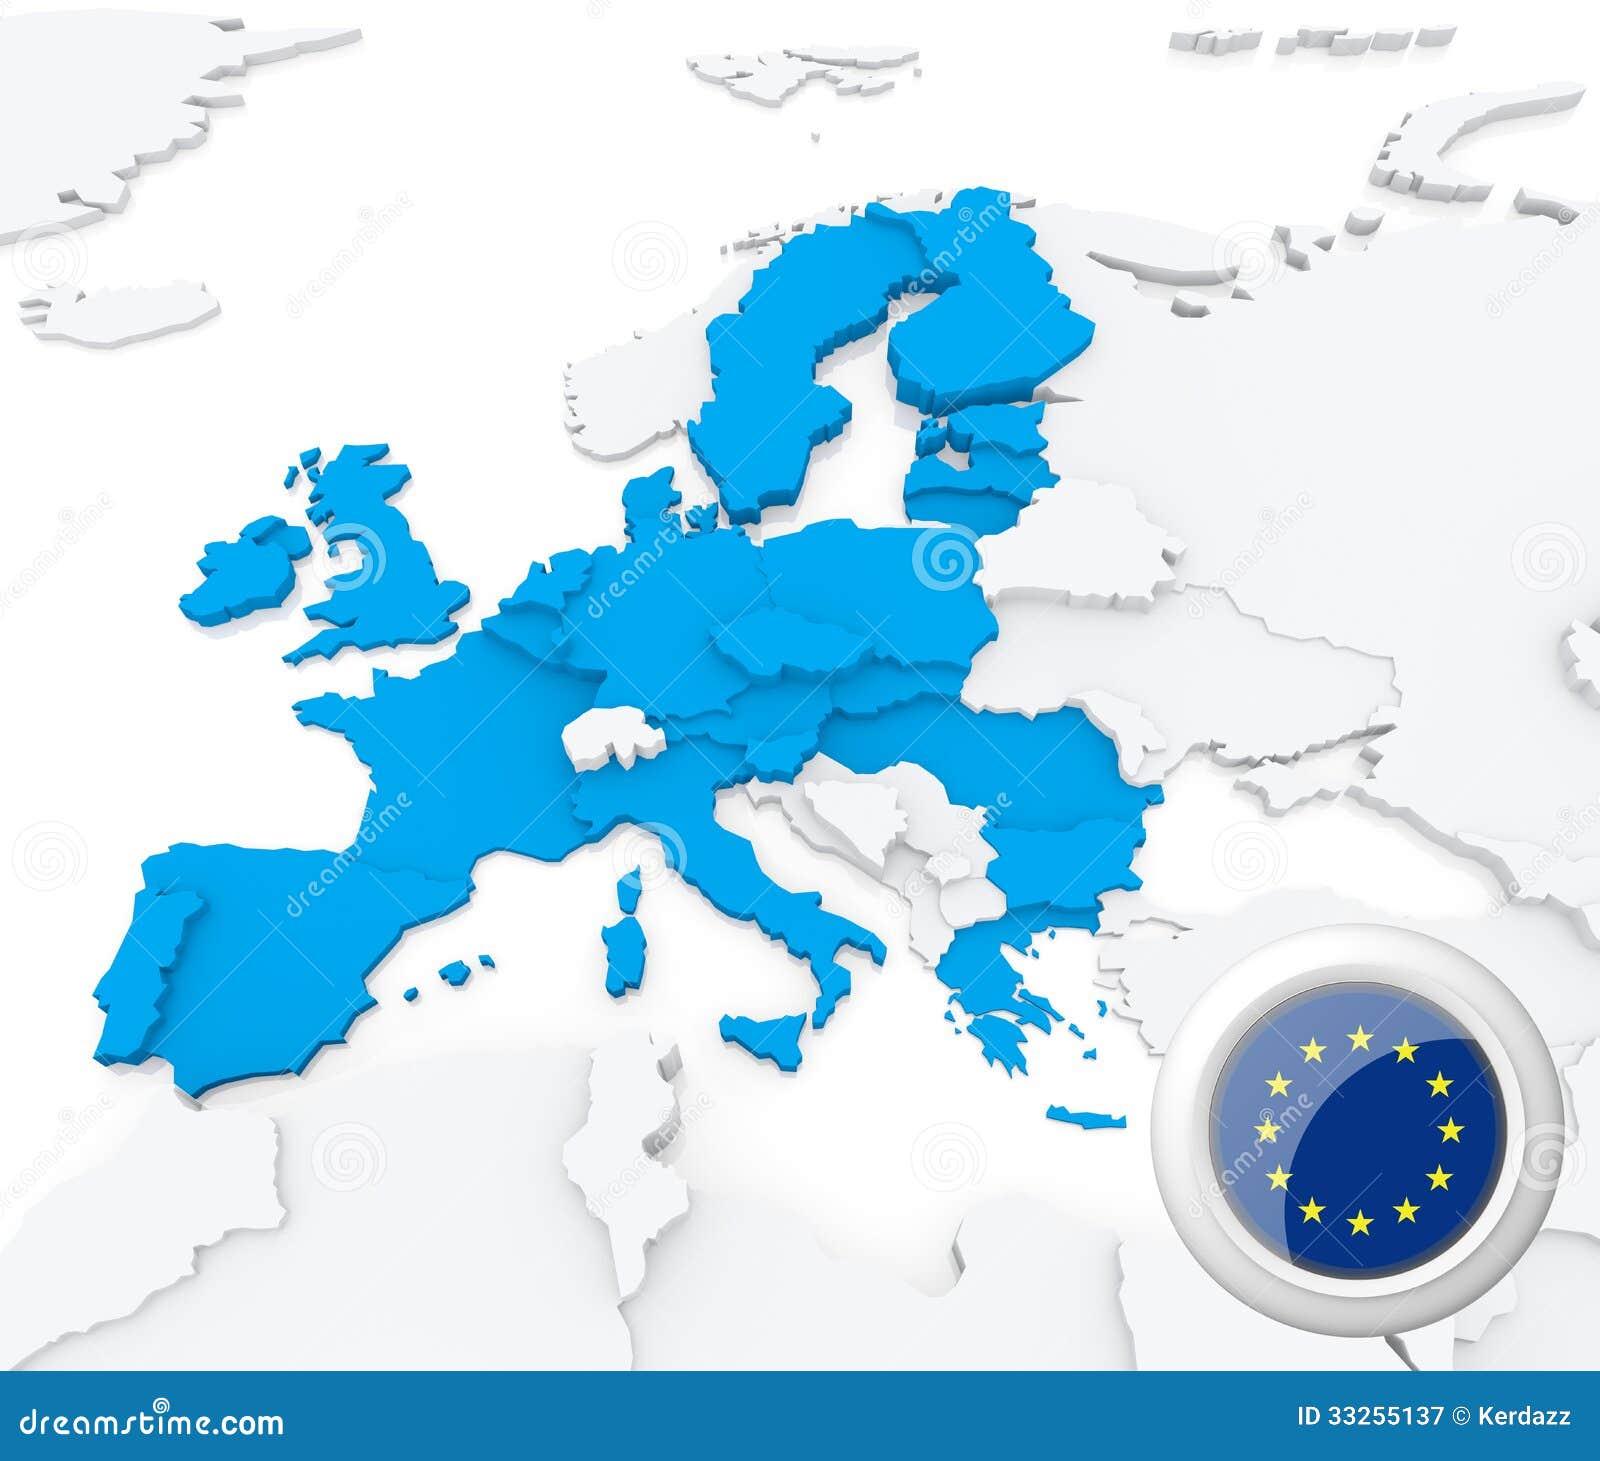 Malta Map Of Europe.European Union On Map Of Europe Stock Illustration Illustration Of